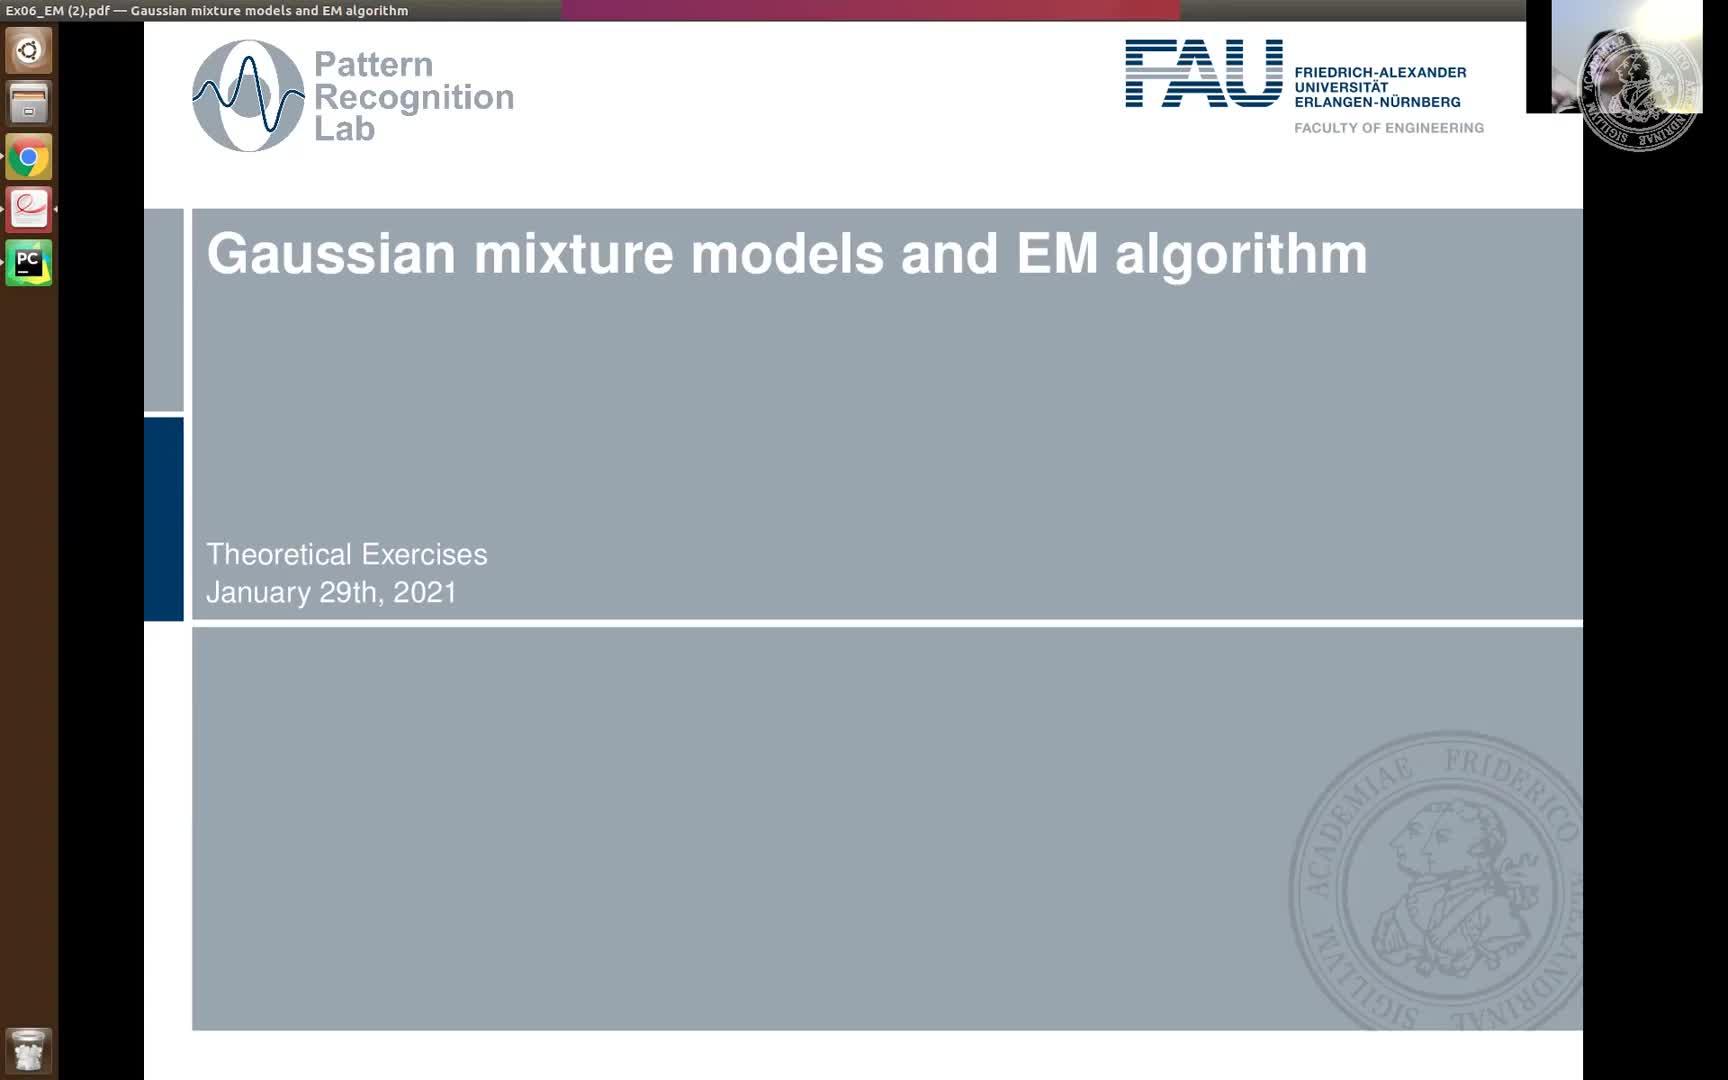 Ex06 Gaussian Mixture Model and EM algorithm preview image